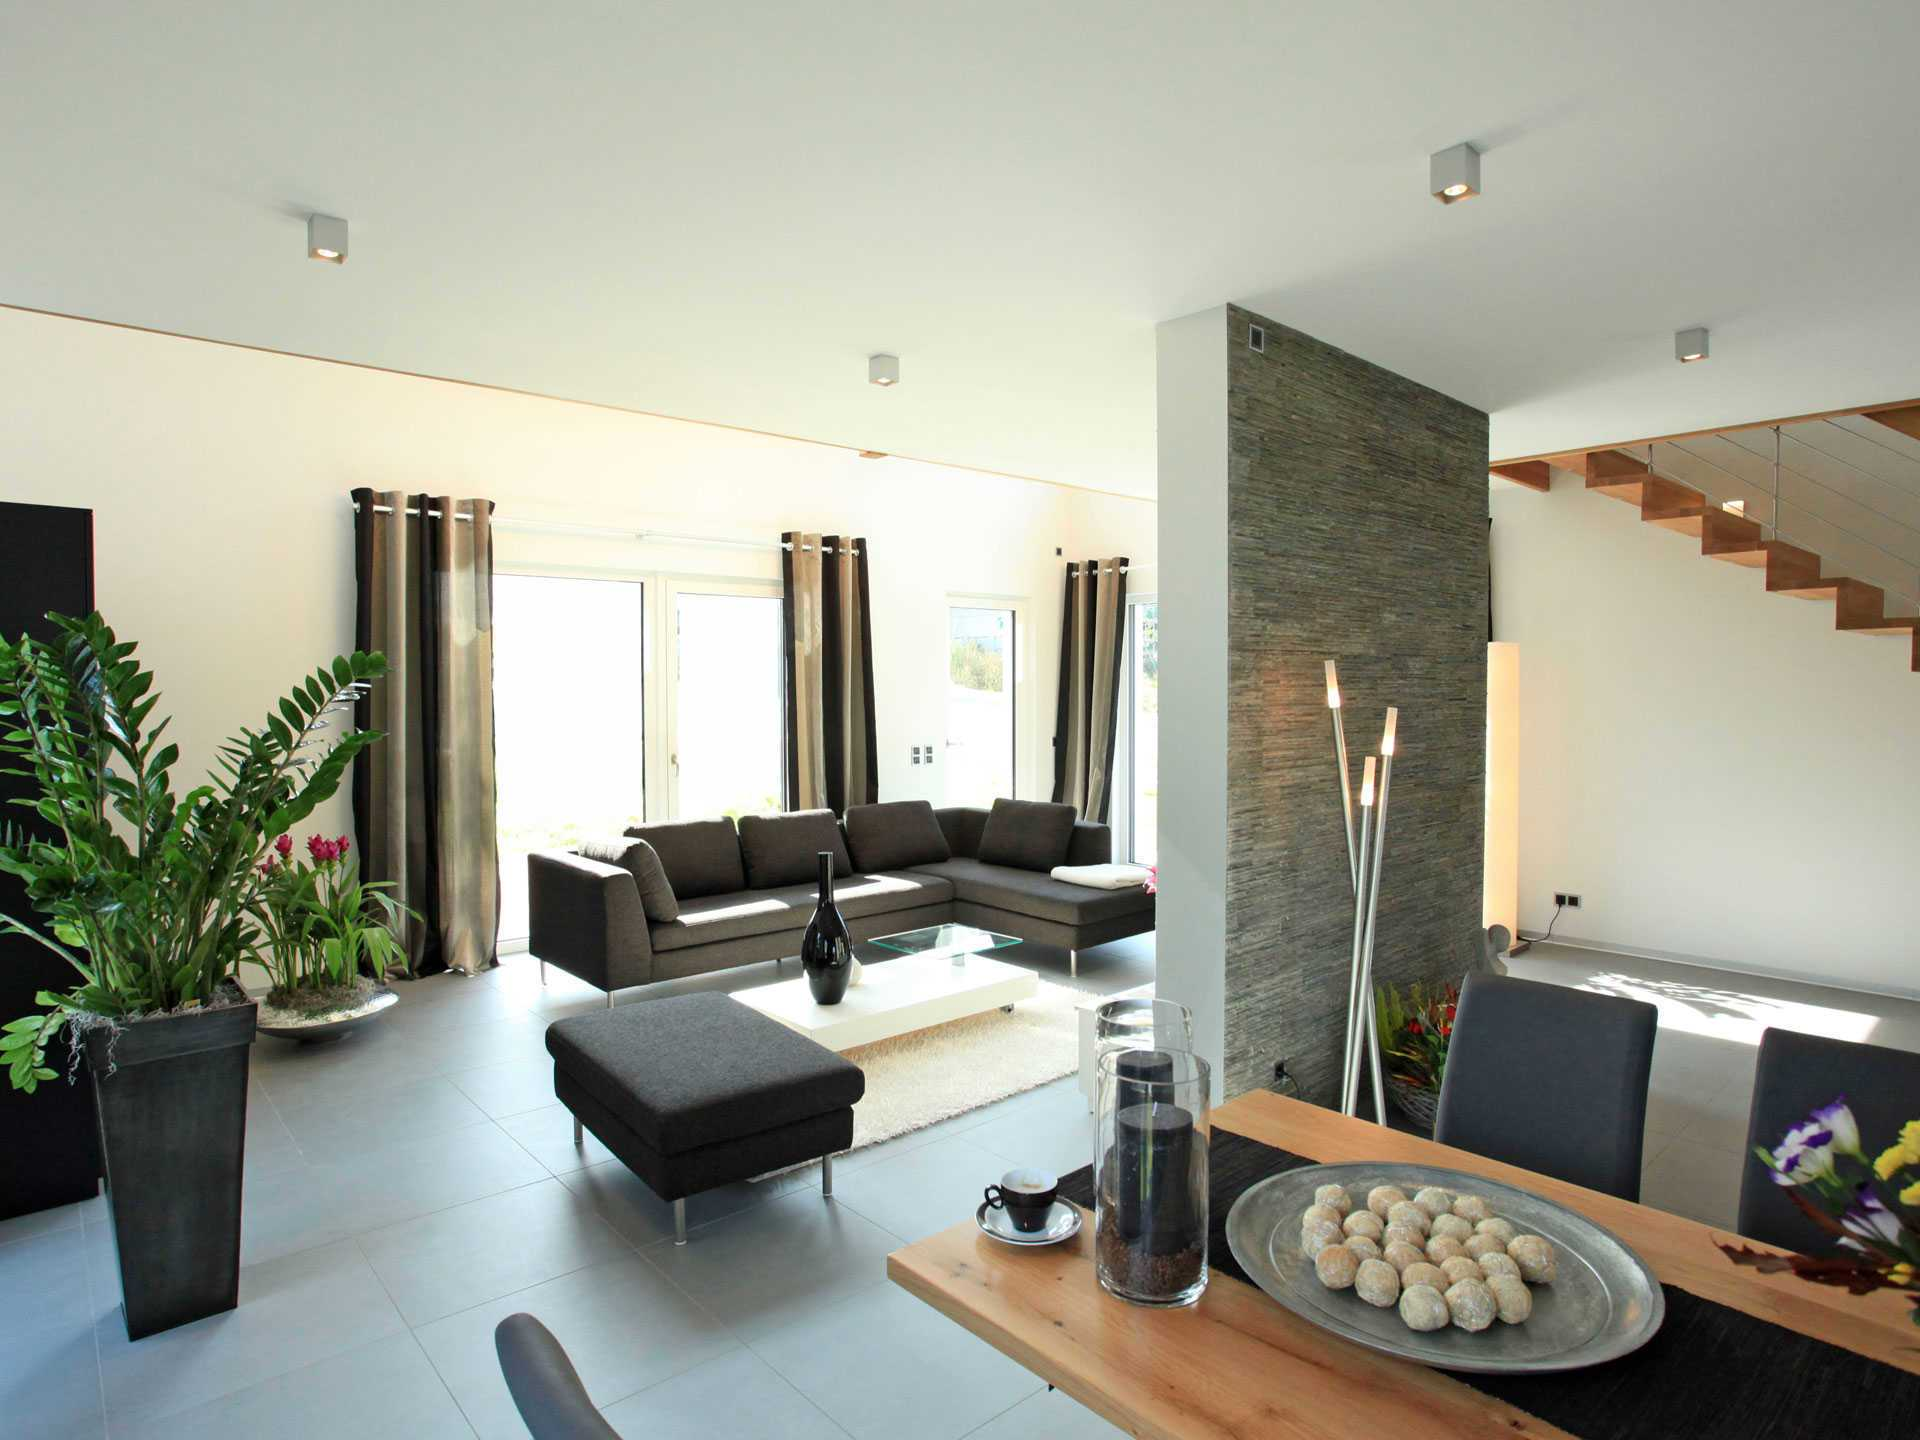 stadtvilla bh 205 lechner massivhaus. Black Bedroom Furniture Sets. Home Design Ideas